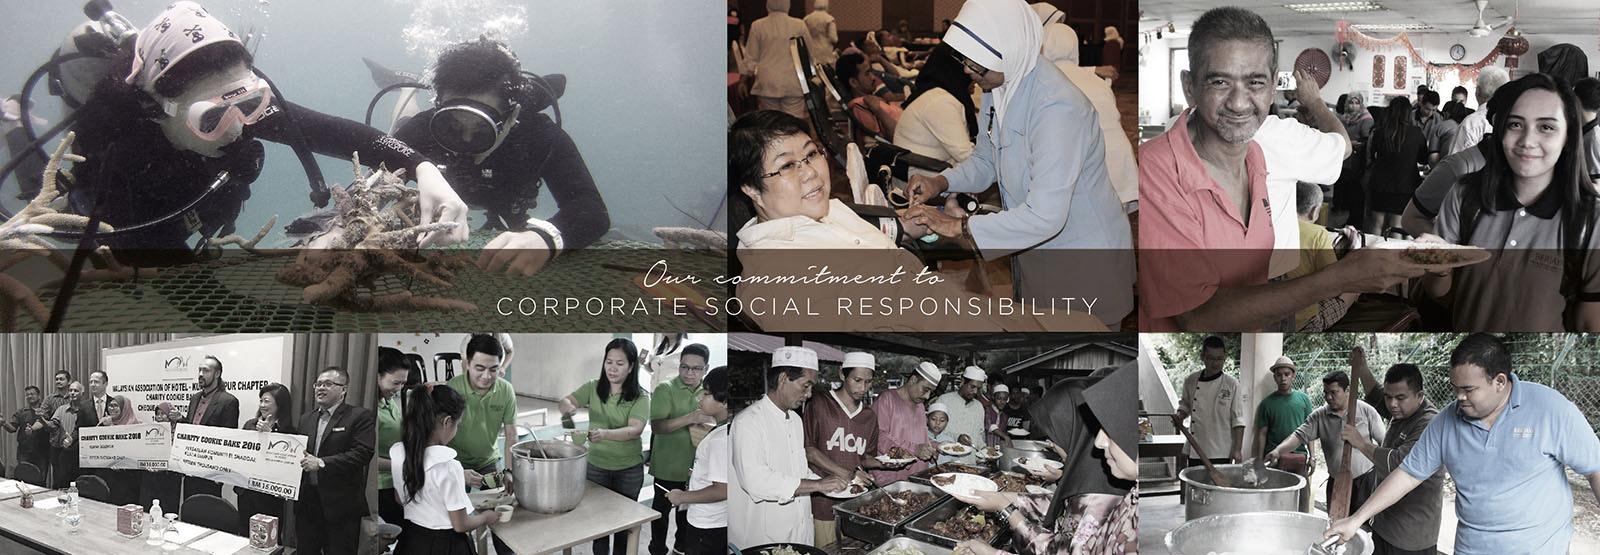 Unforgettable Iftar & Raya Treats For Special Needs Children At Berjaya Langkawi Resort